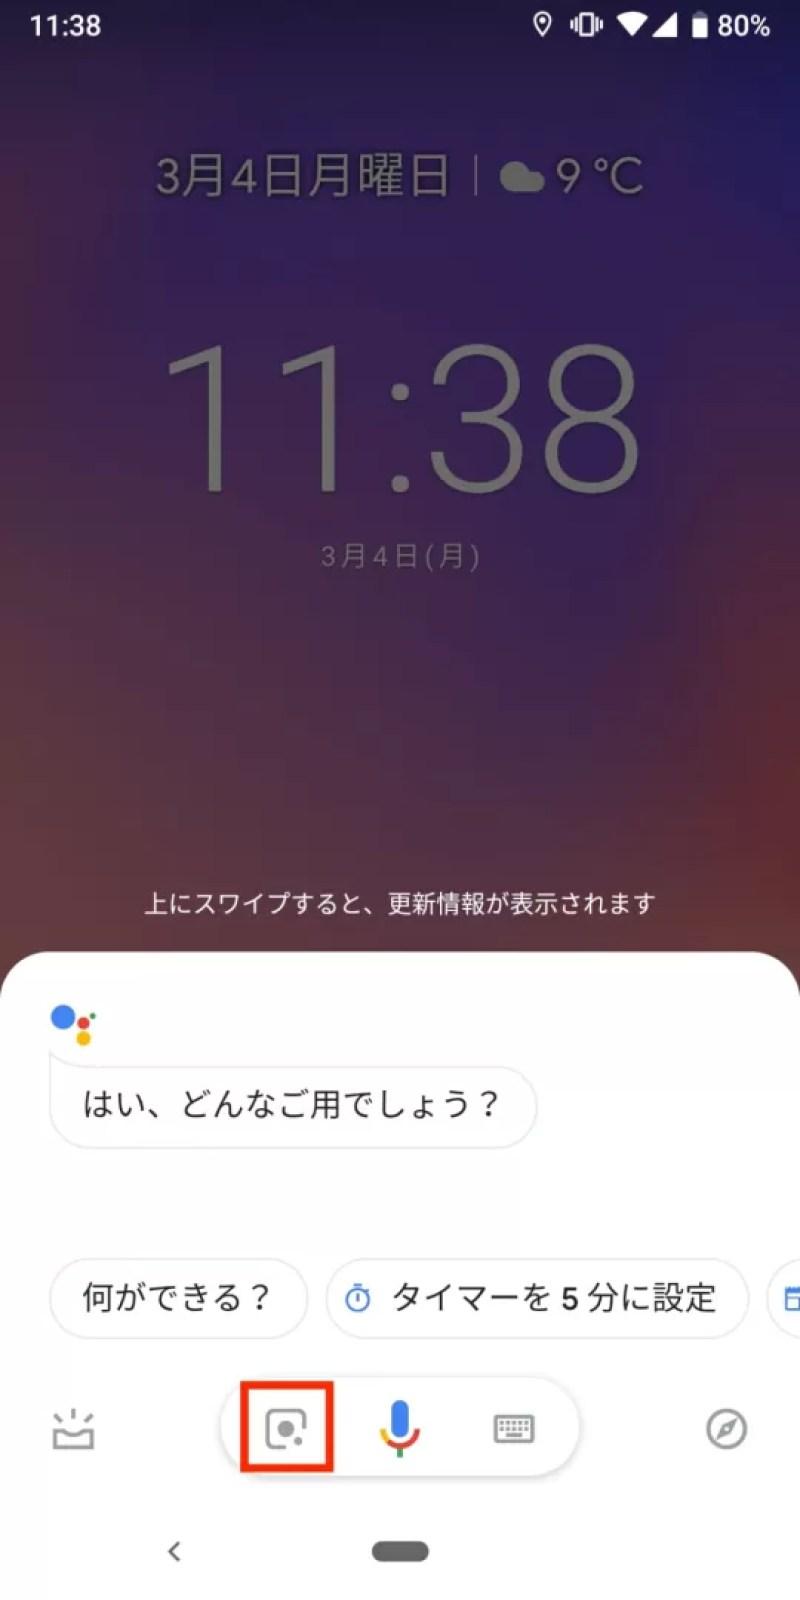 GoogleアシスタントからGoogleレンズを起動